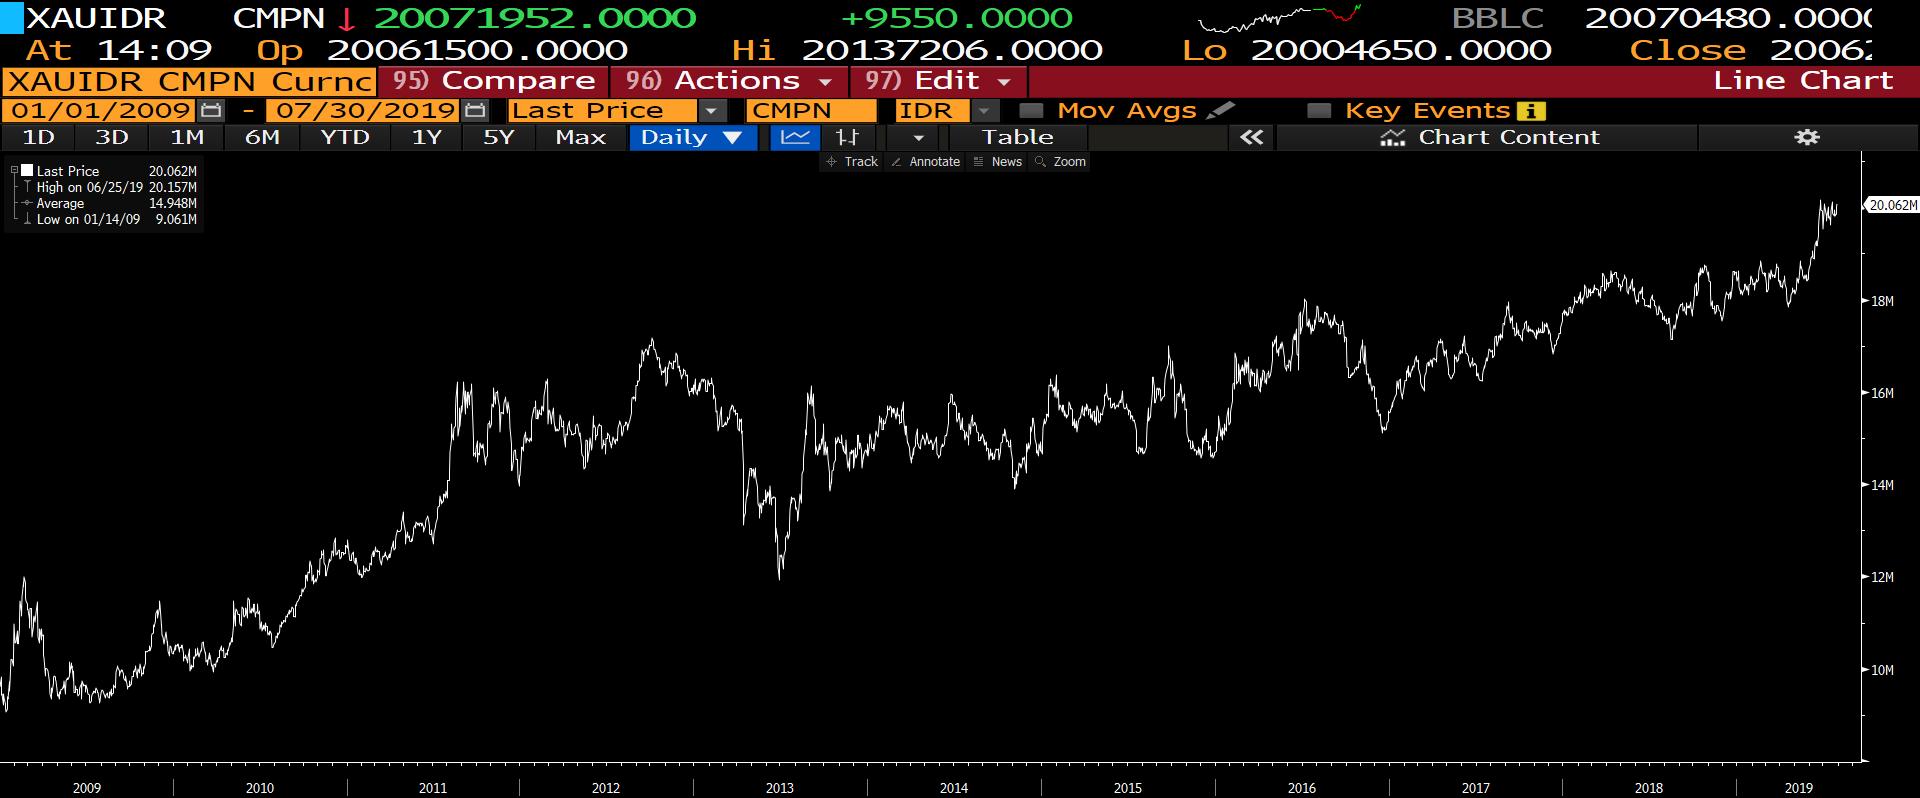 harga emas 10 tahun terakhir